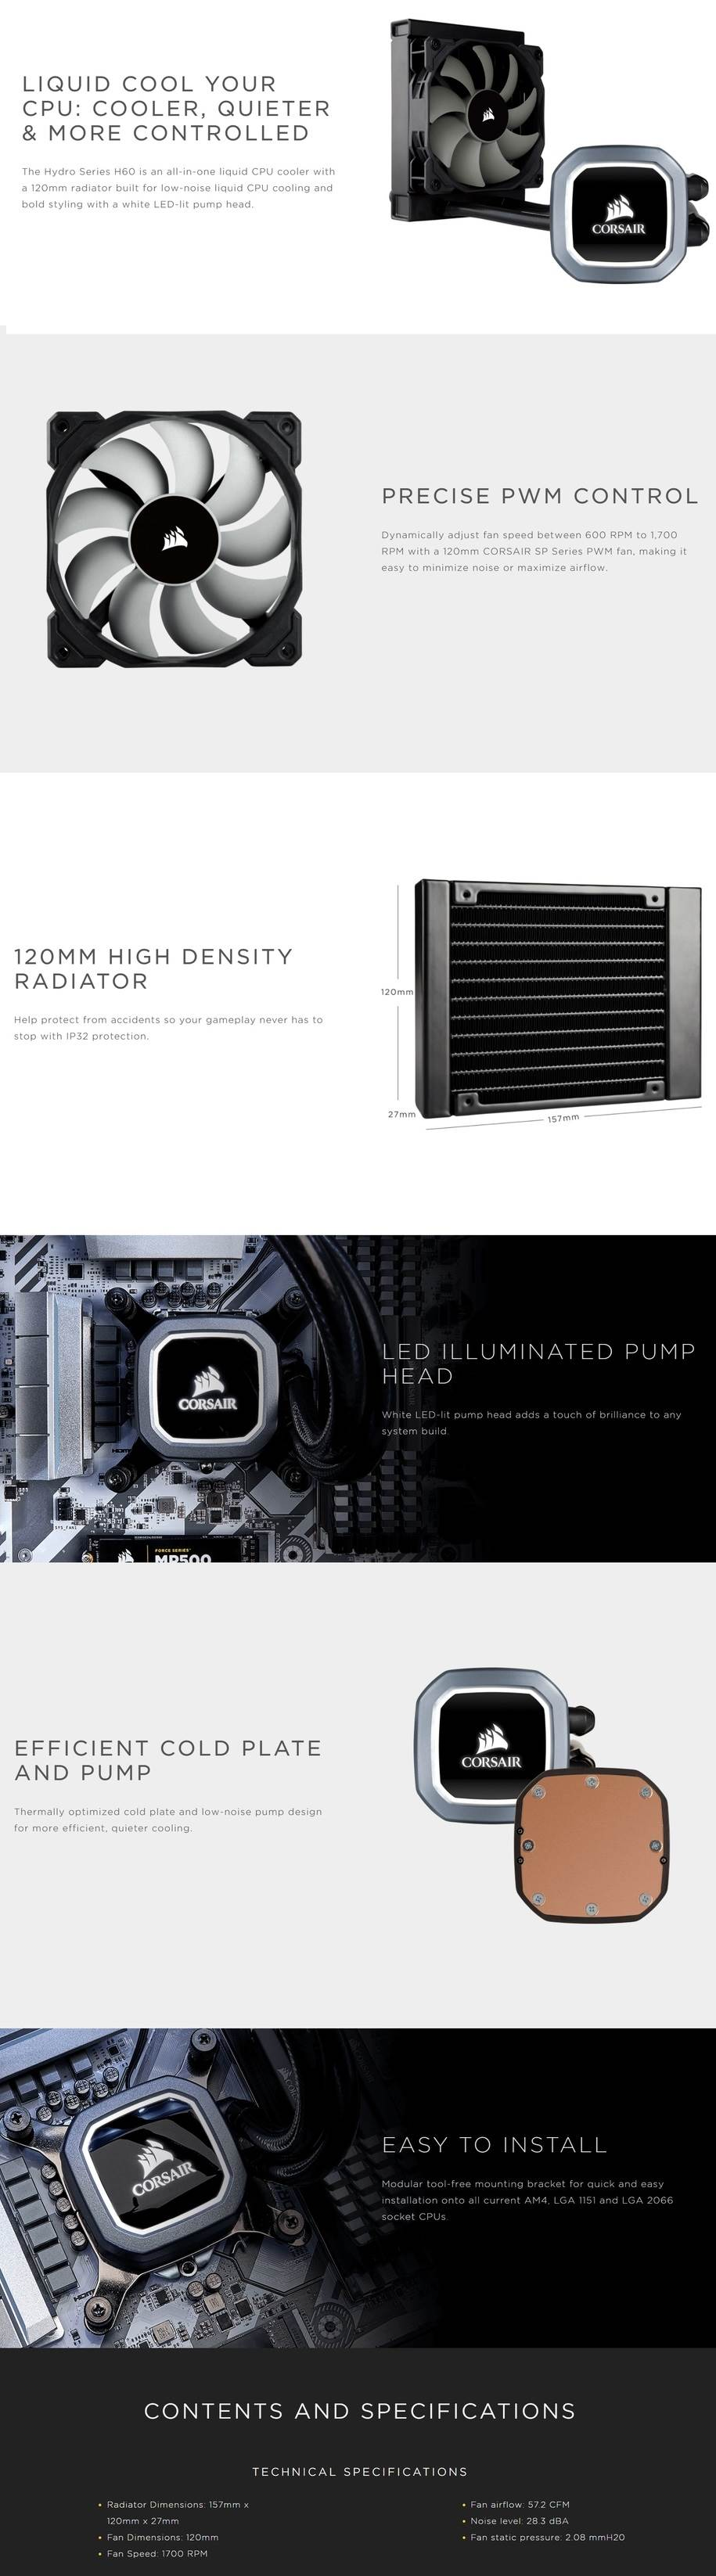 Corsair Hydro Series H60 v2 (2018) 120mm High Performance Liquid CPU Cooler - Desktop Overview 1